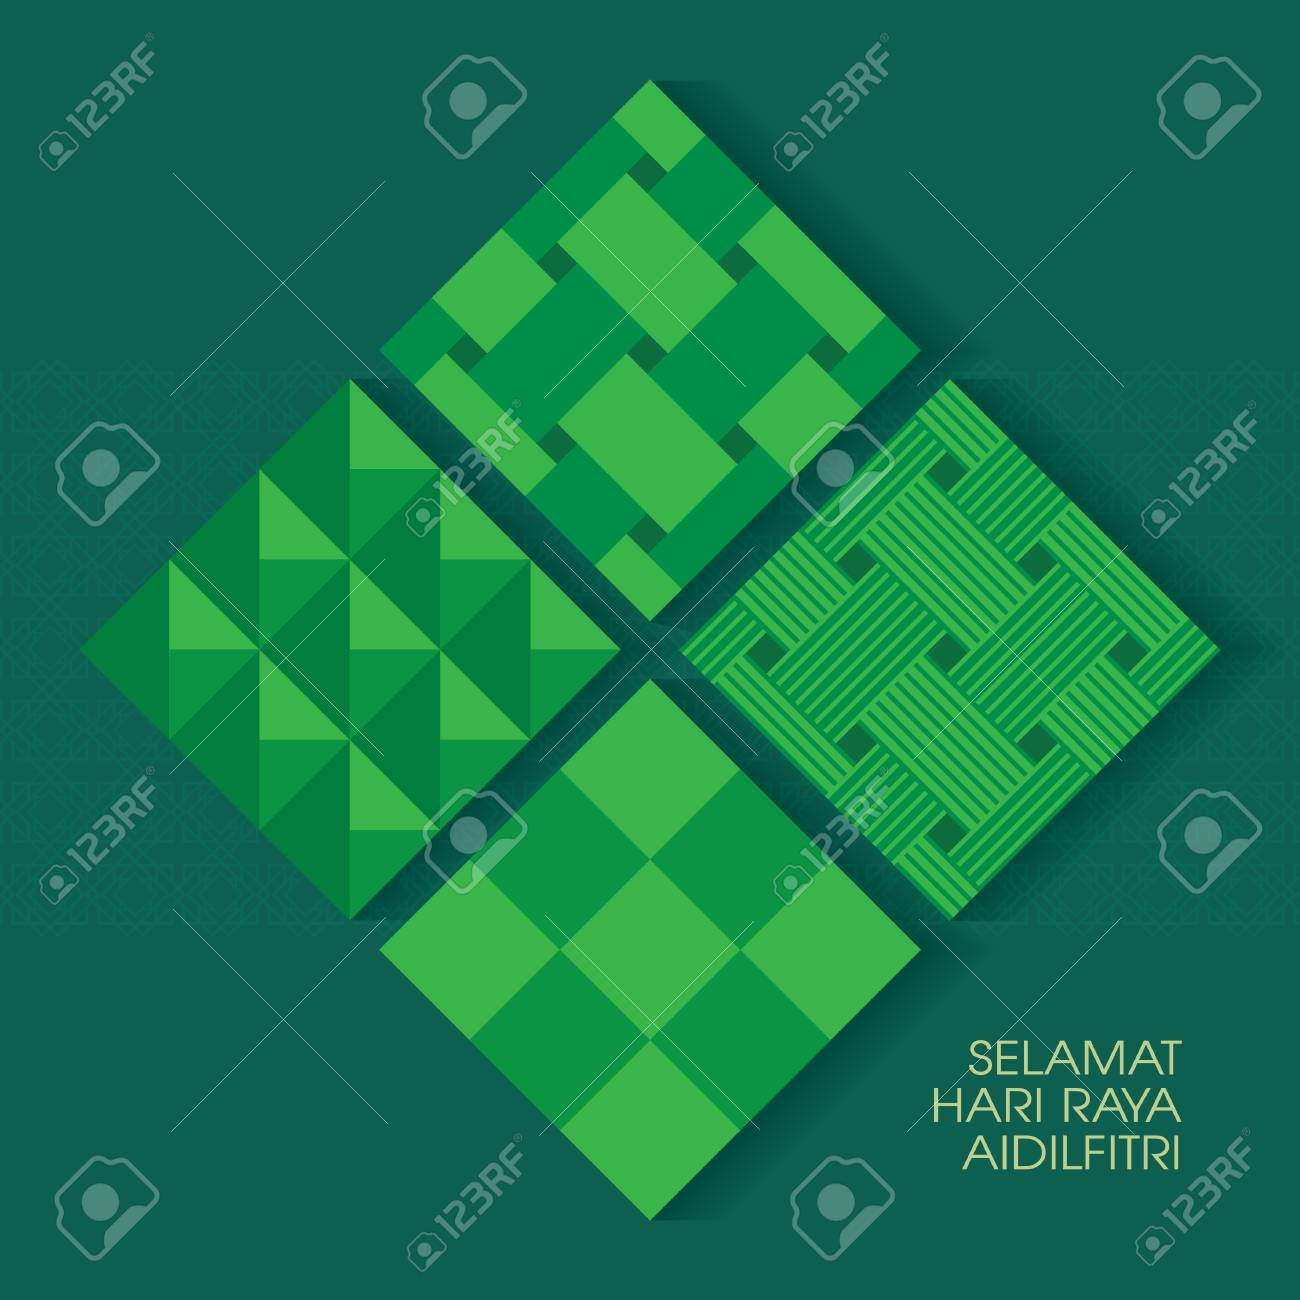 Selamat Hari Raya Aidilfitri vector illustration with ketupat with Islamic pattern as background. Caption: Fasting Day of Celebration - 102576531